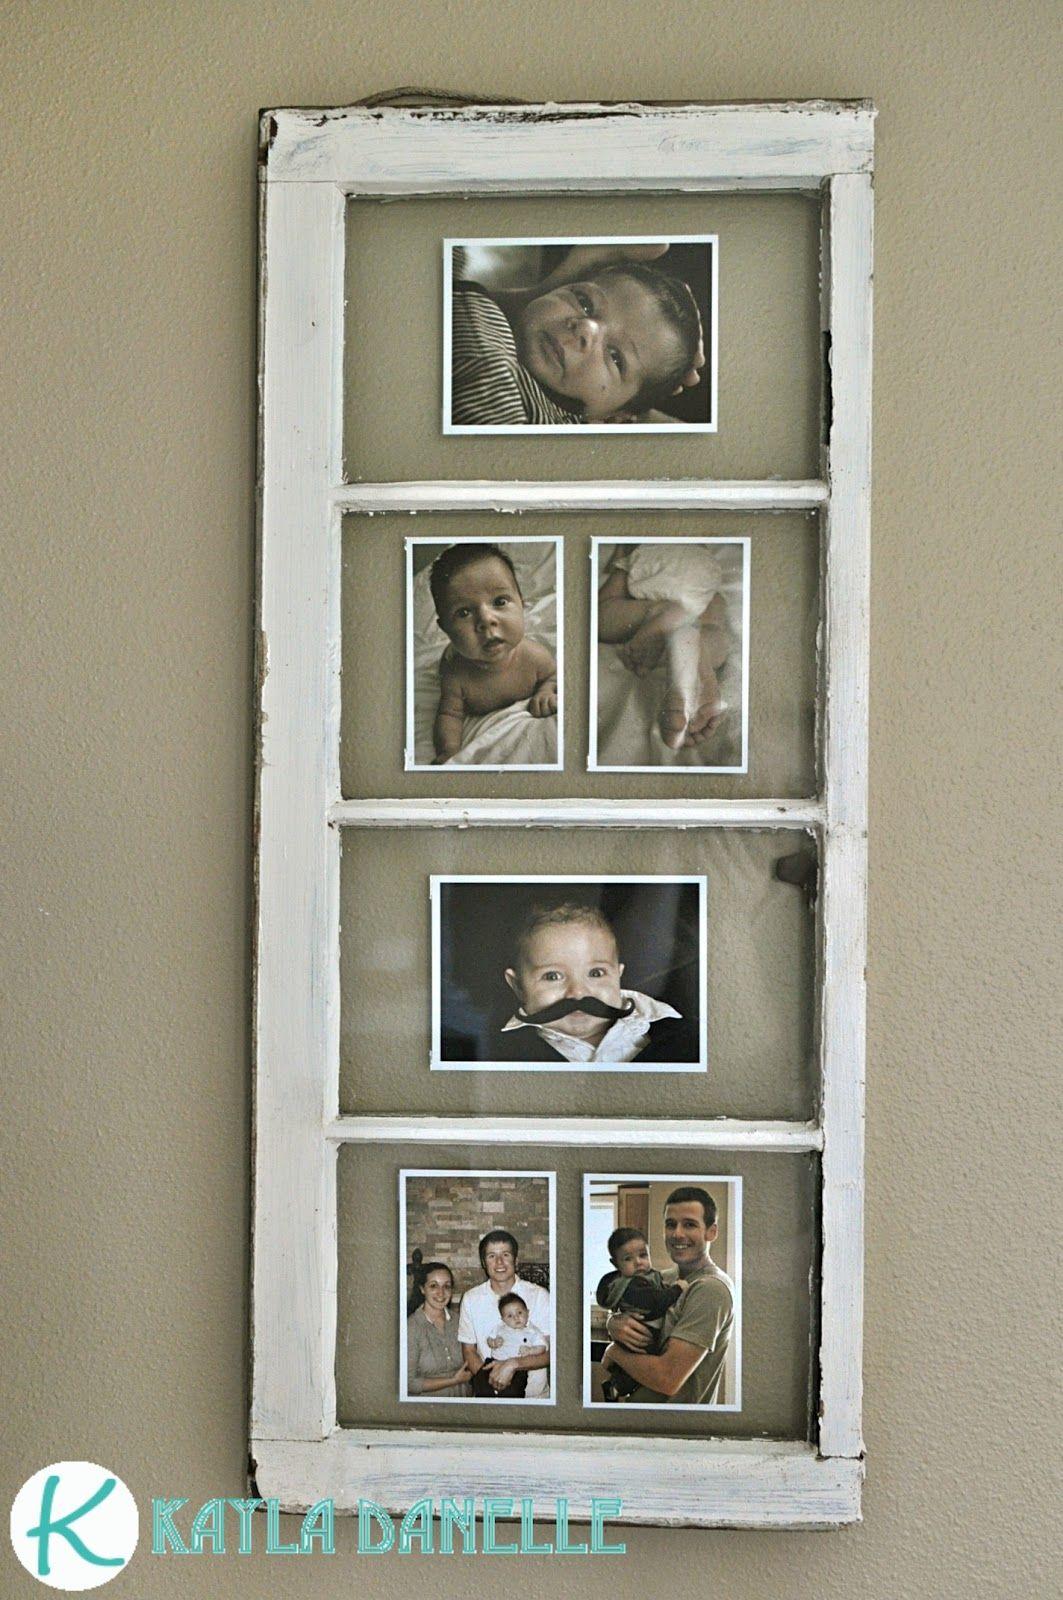 Window pane ideas  old window picture frames  windows  pinterest  window picture